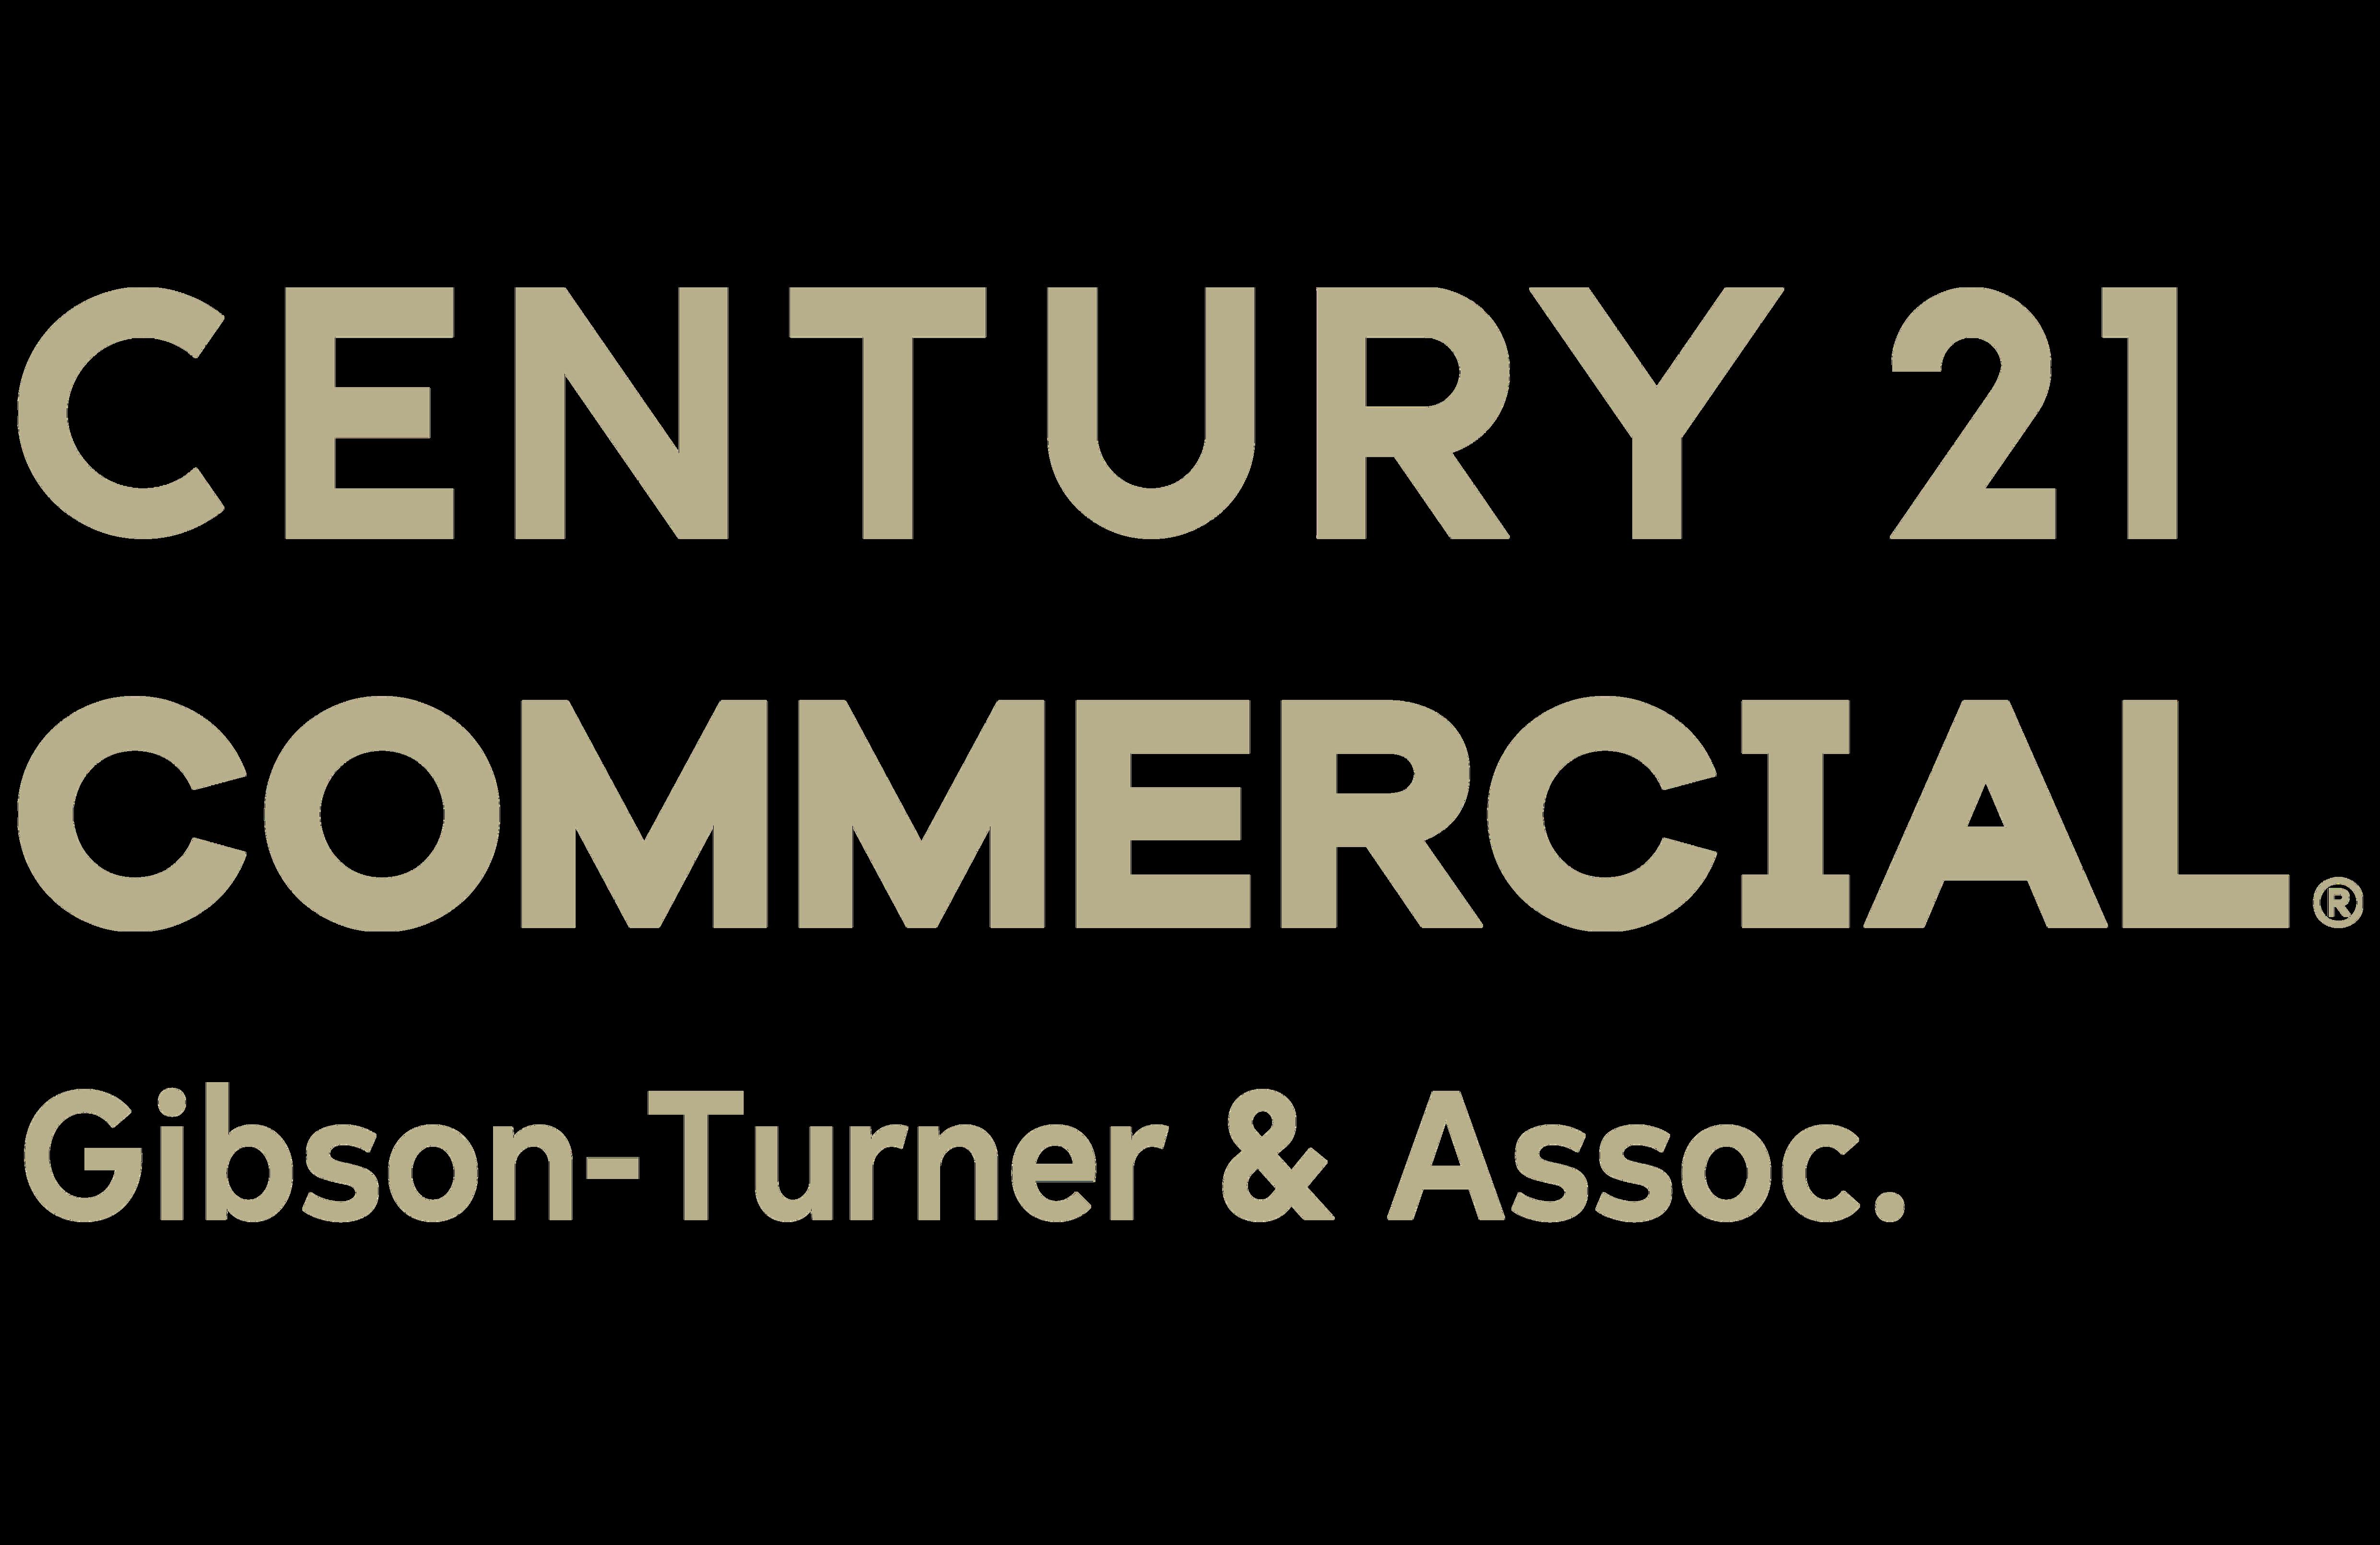 CENTURY 21 Gibson-Turner & Assoc.